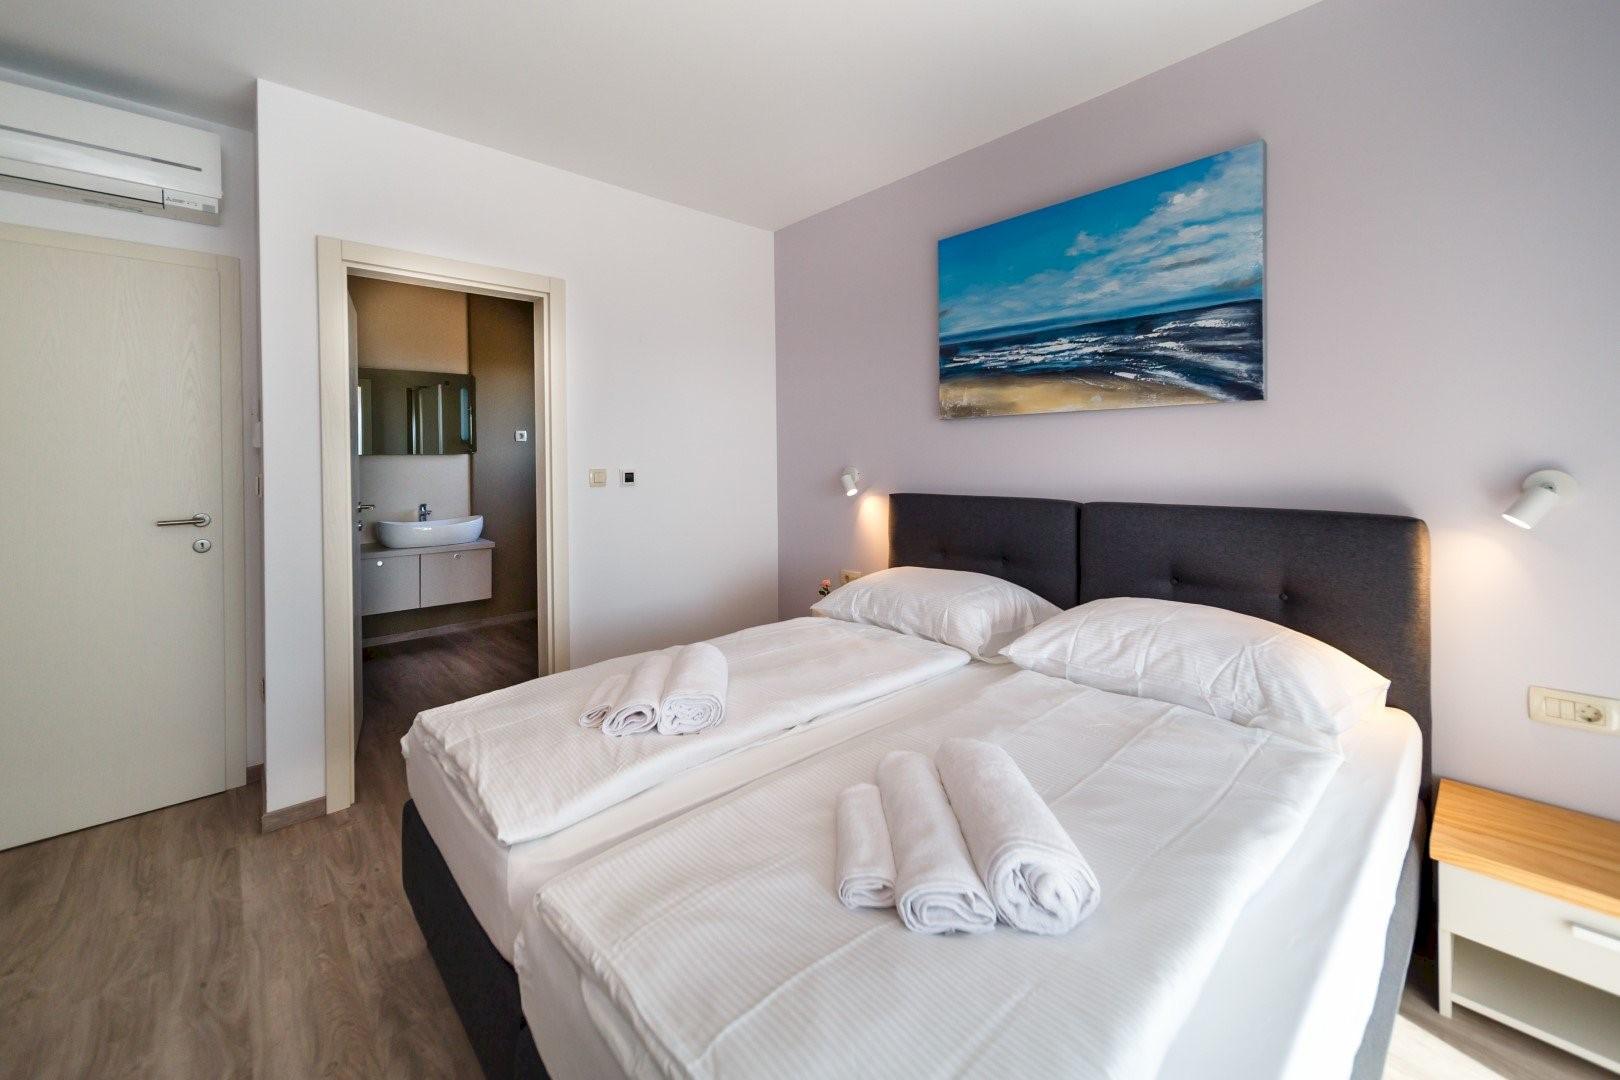 Ferienhaus Luxury Villa Loma 1 (2586644), Sveti Vid-Miholjice, Insel Krk, Kvarner, Kroatien, Bild 13